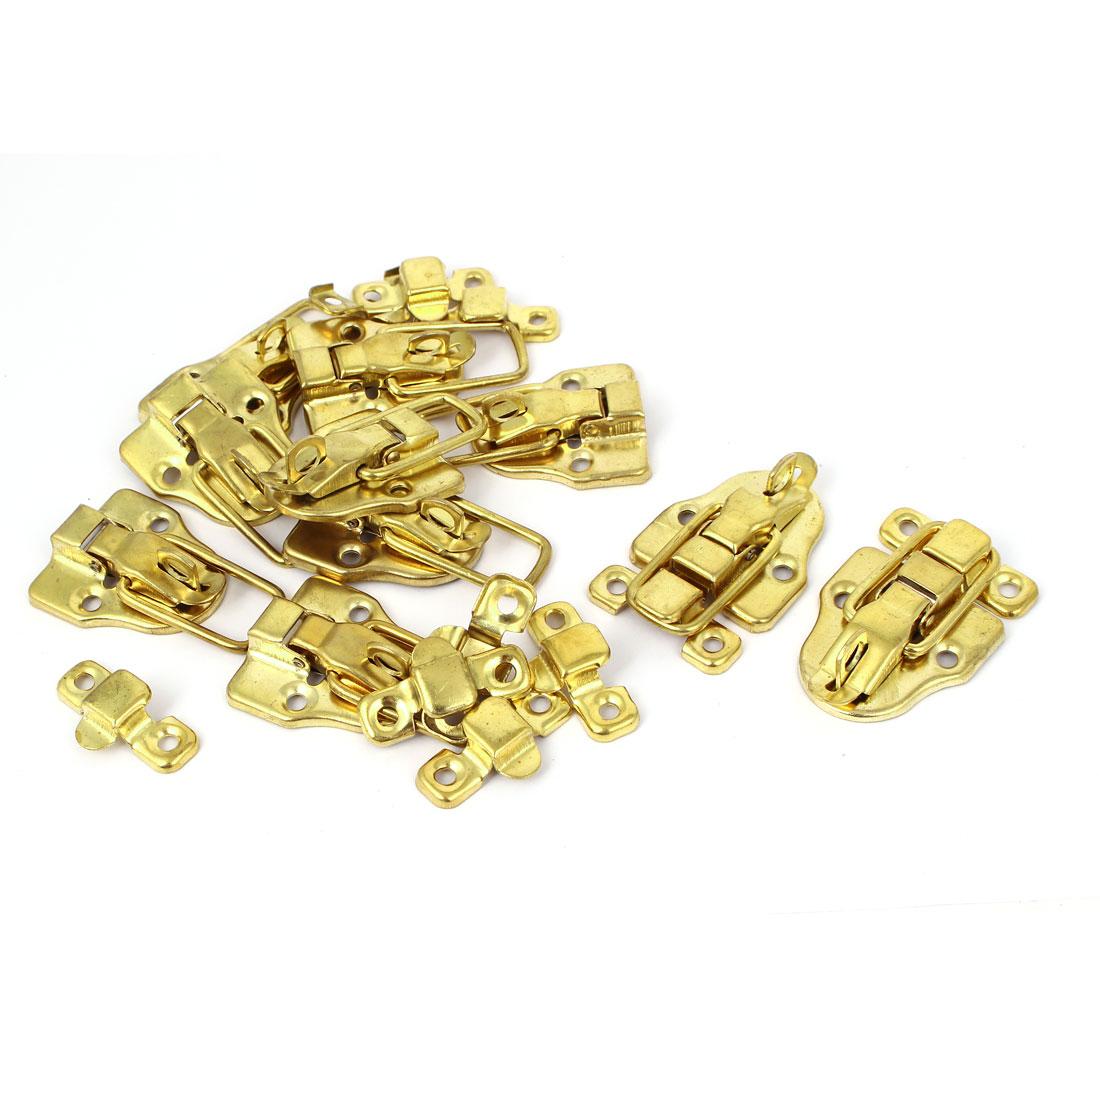 L187E5 Metal Wardrobe Box Case Safe Lock Toggle Latch Hasp Gold Tone 10pcs